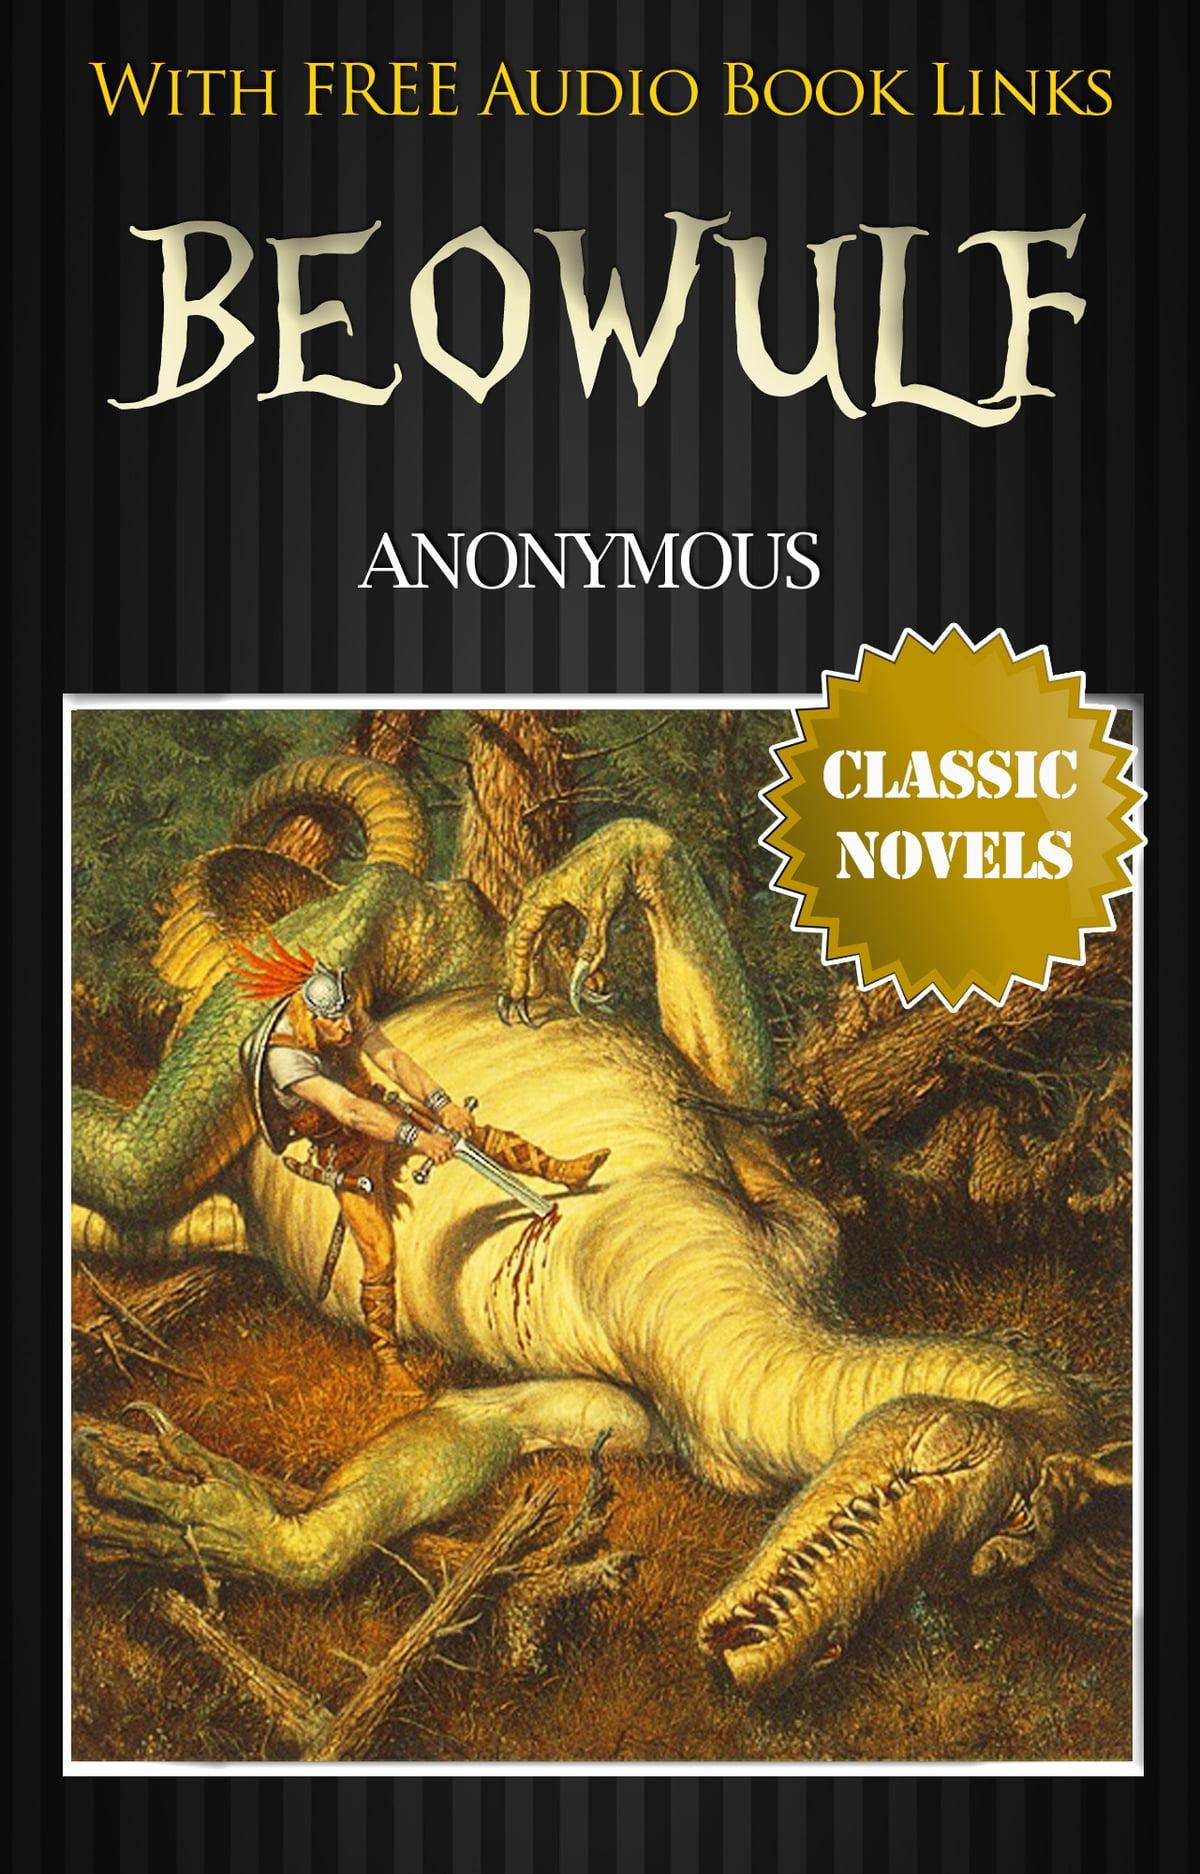 BEOWULF Classic Novels: New Illustrated [Free Audio Links] eBook by Anonymous - 1230000103485 | Rakuten Kobo Ireland